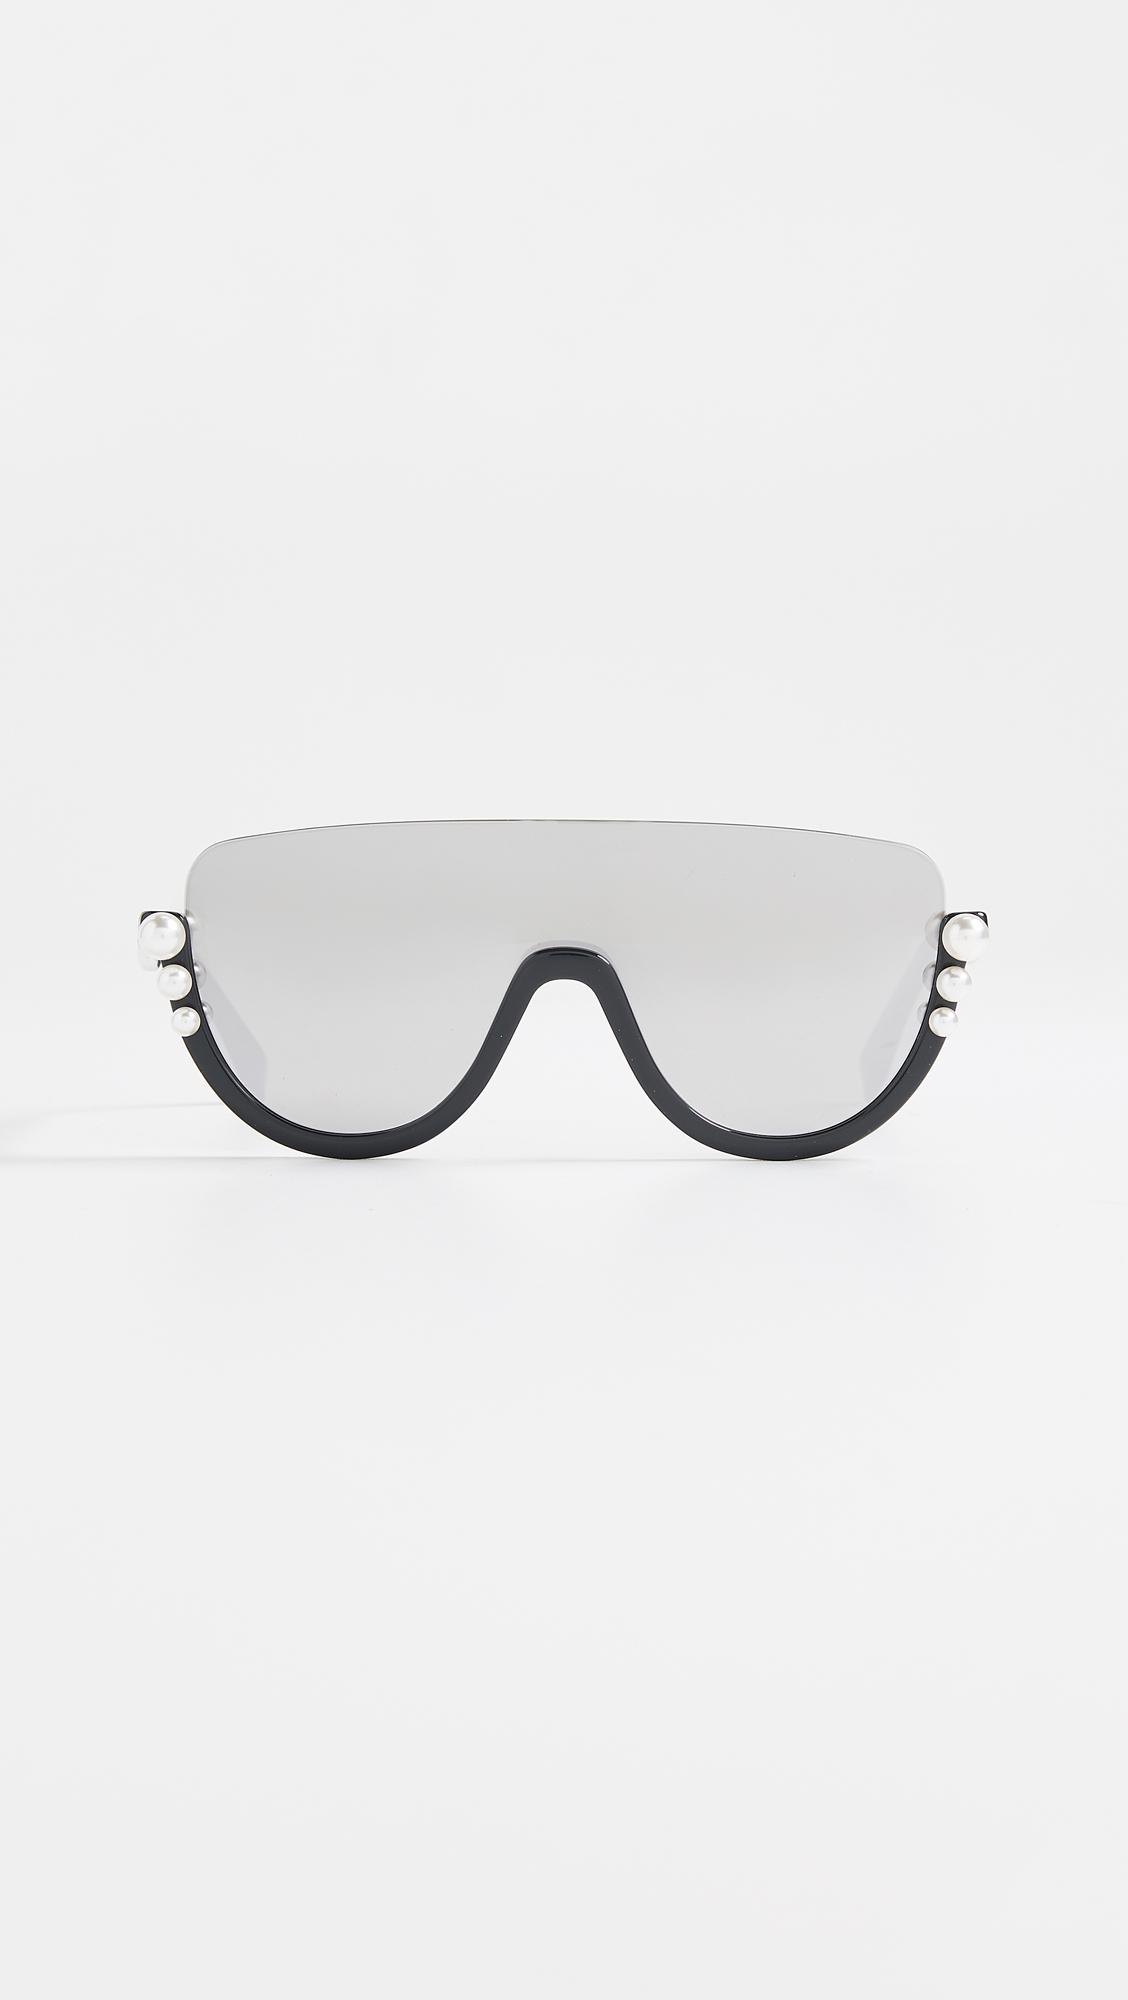 64188f20cf4 Fendi Bottom Frame Imitation Pearl Sunglasses